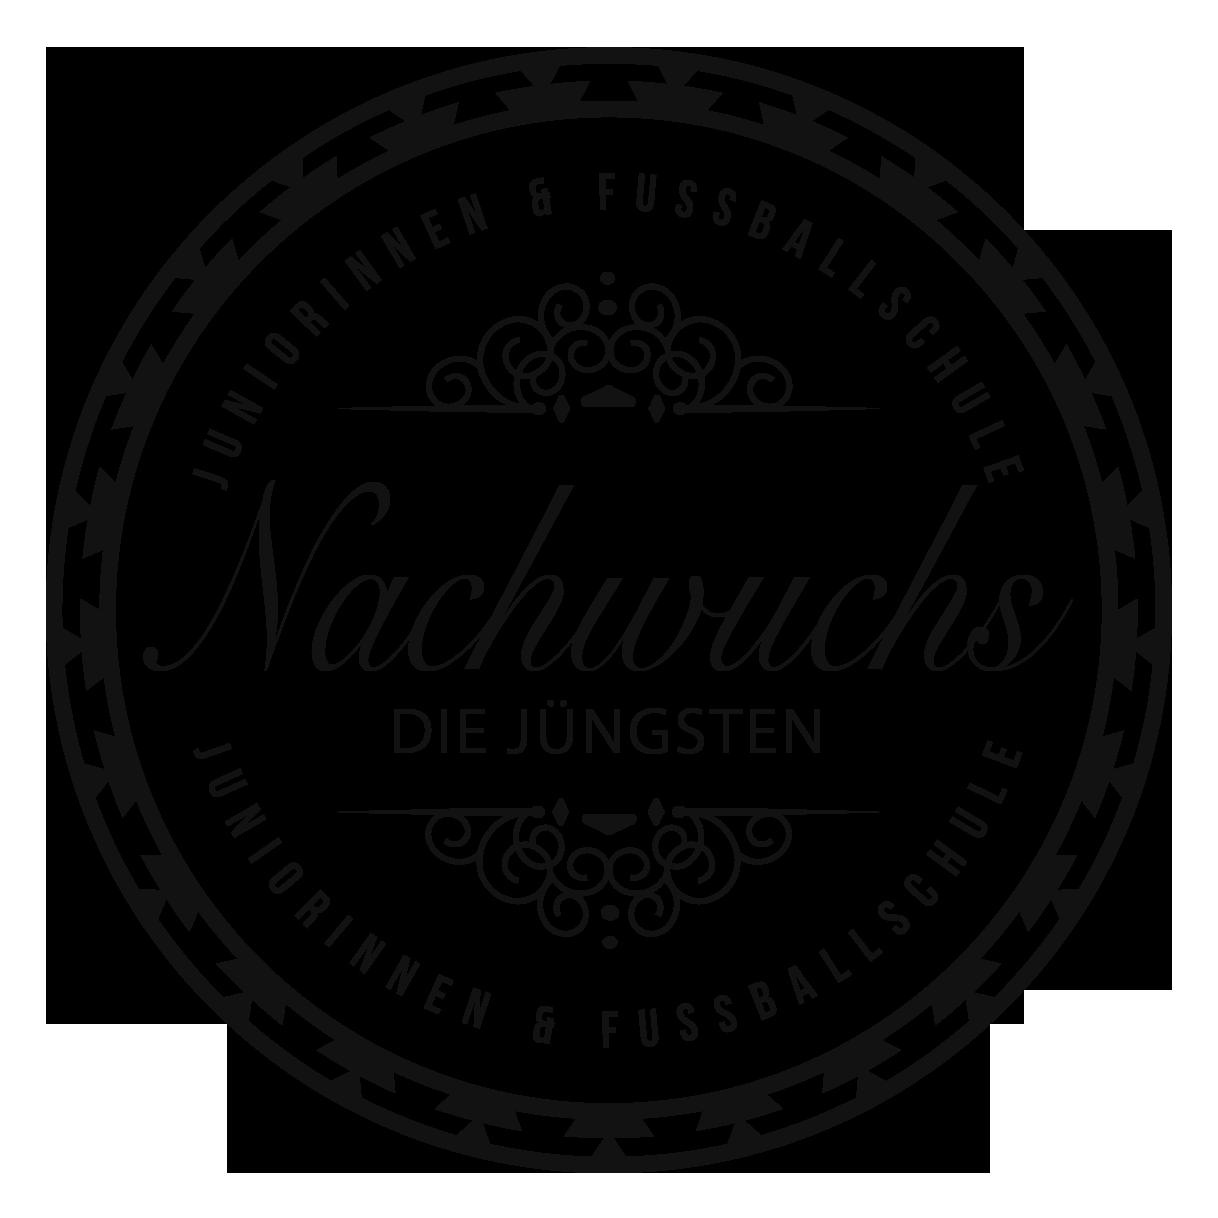 bdg-nachwuchs.png